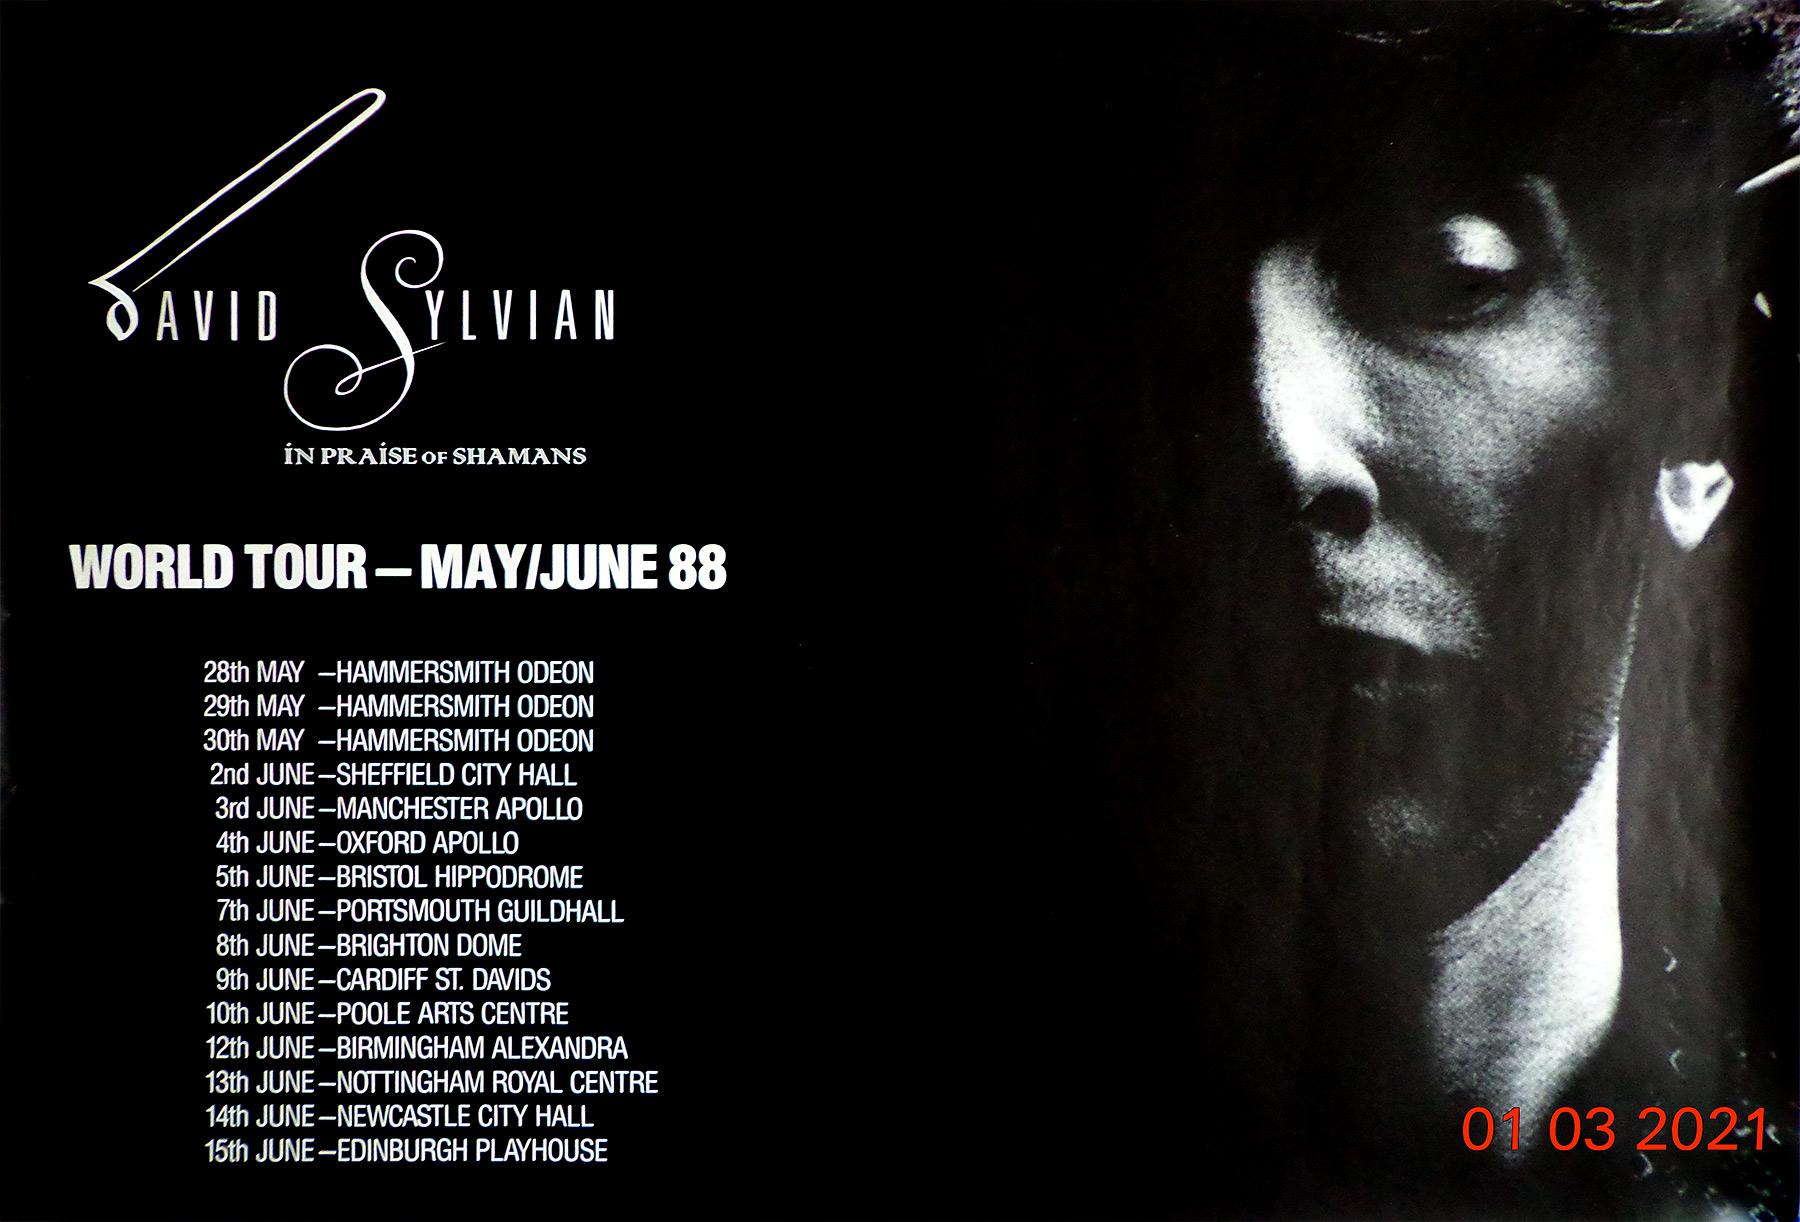 Big David Sylvian 1988 tour poster. Thanks to Cedric Laudet